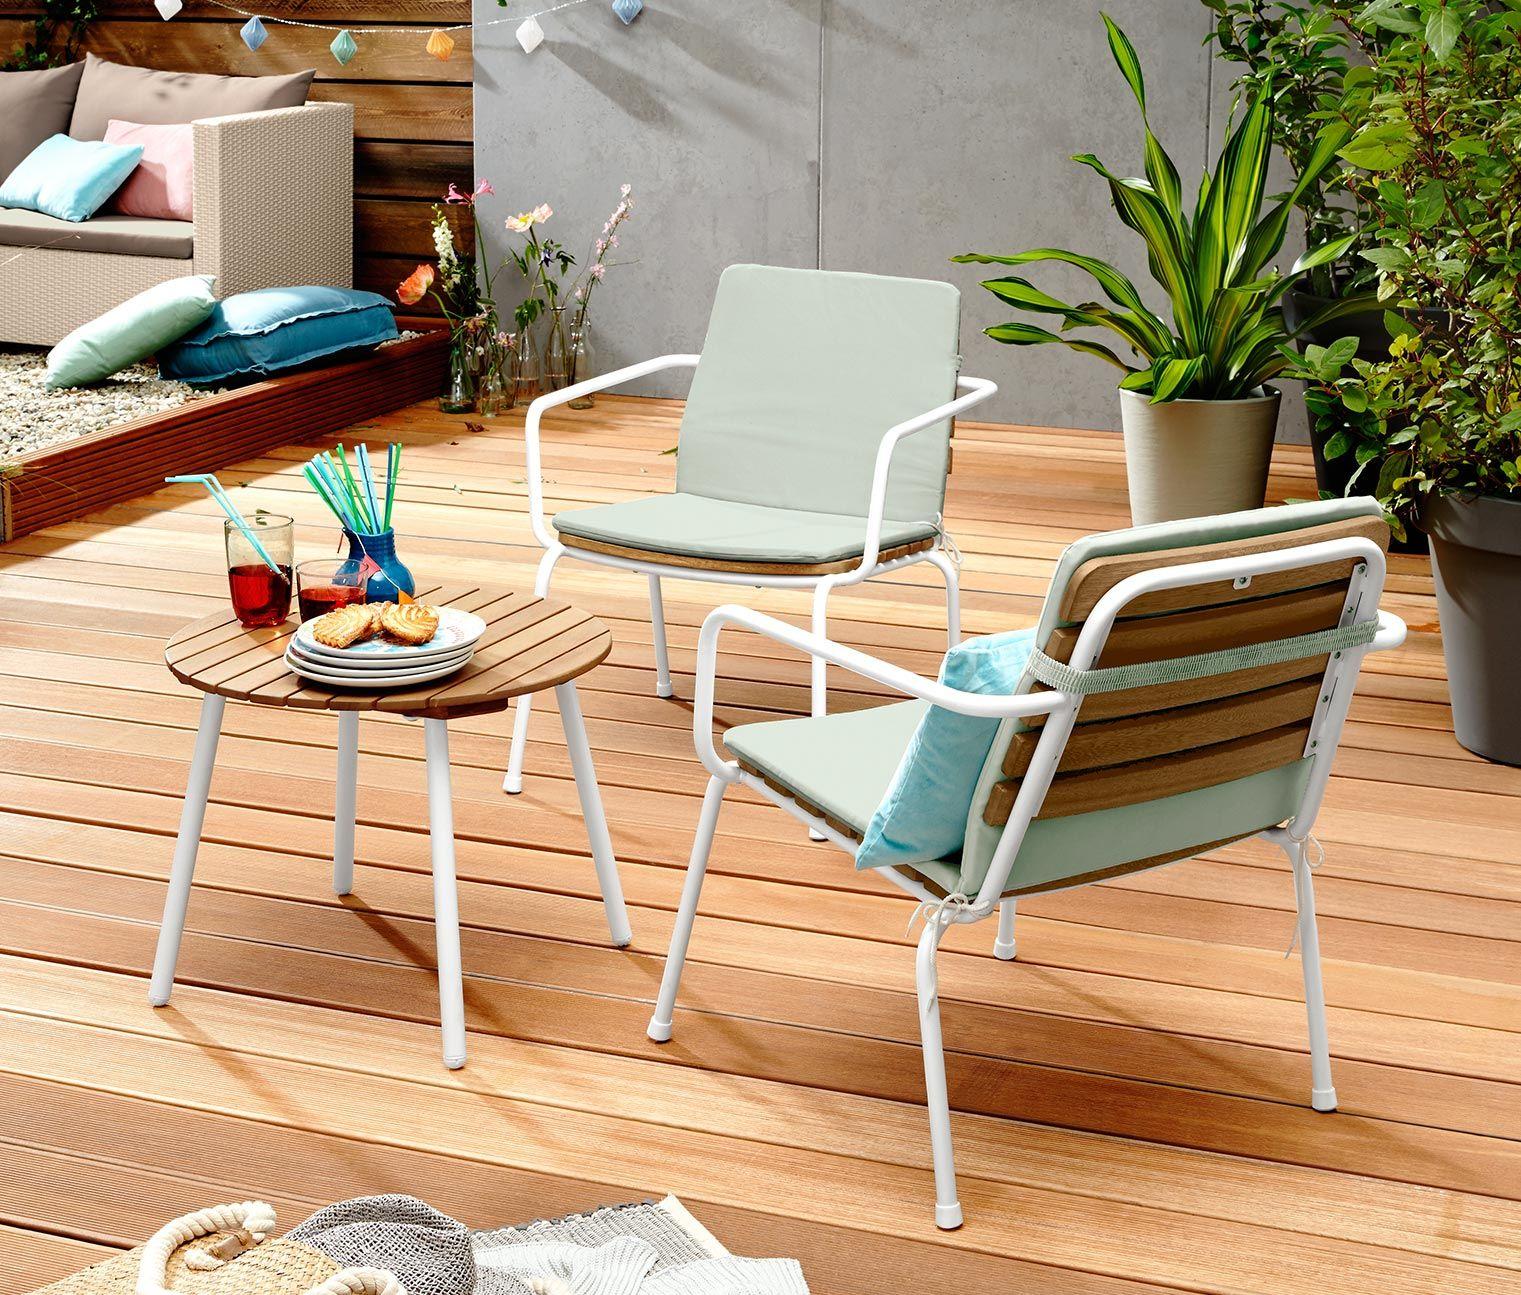 Kerti Szek Es Asztal Szett 3 Reszes Fa 344087 A Tchibo Nal Outdoor Chairs Lounge Sets Outdoor Furniture